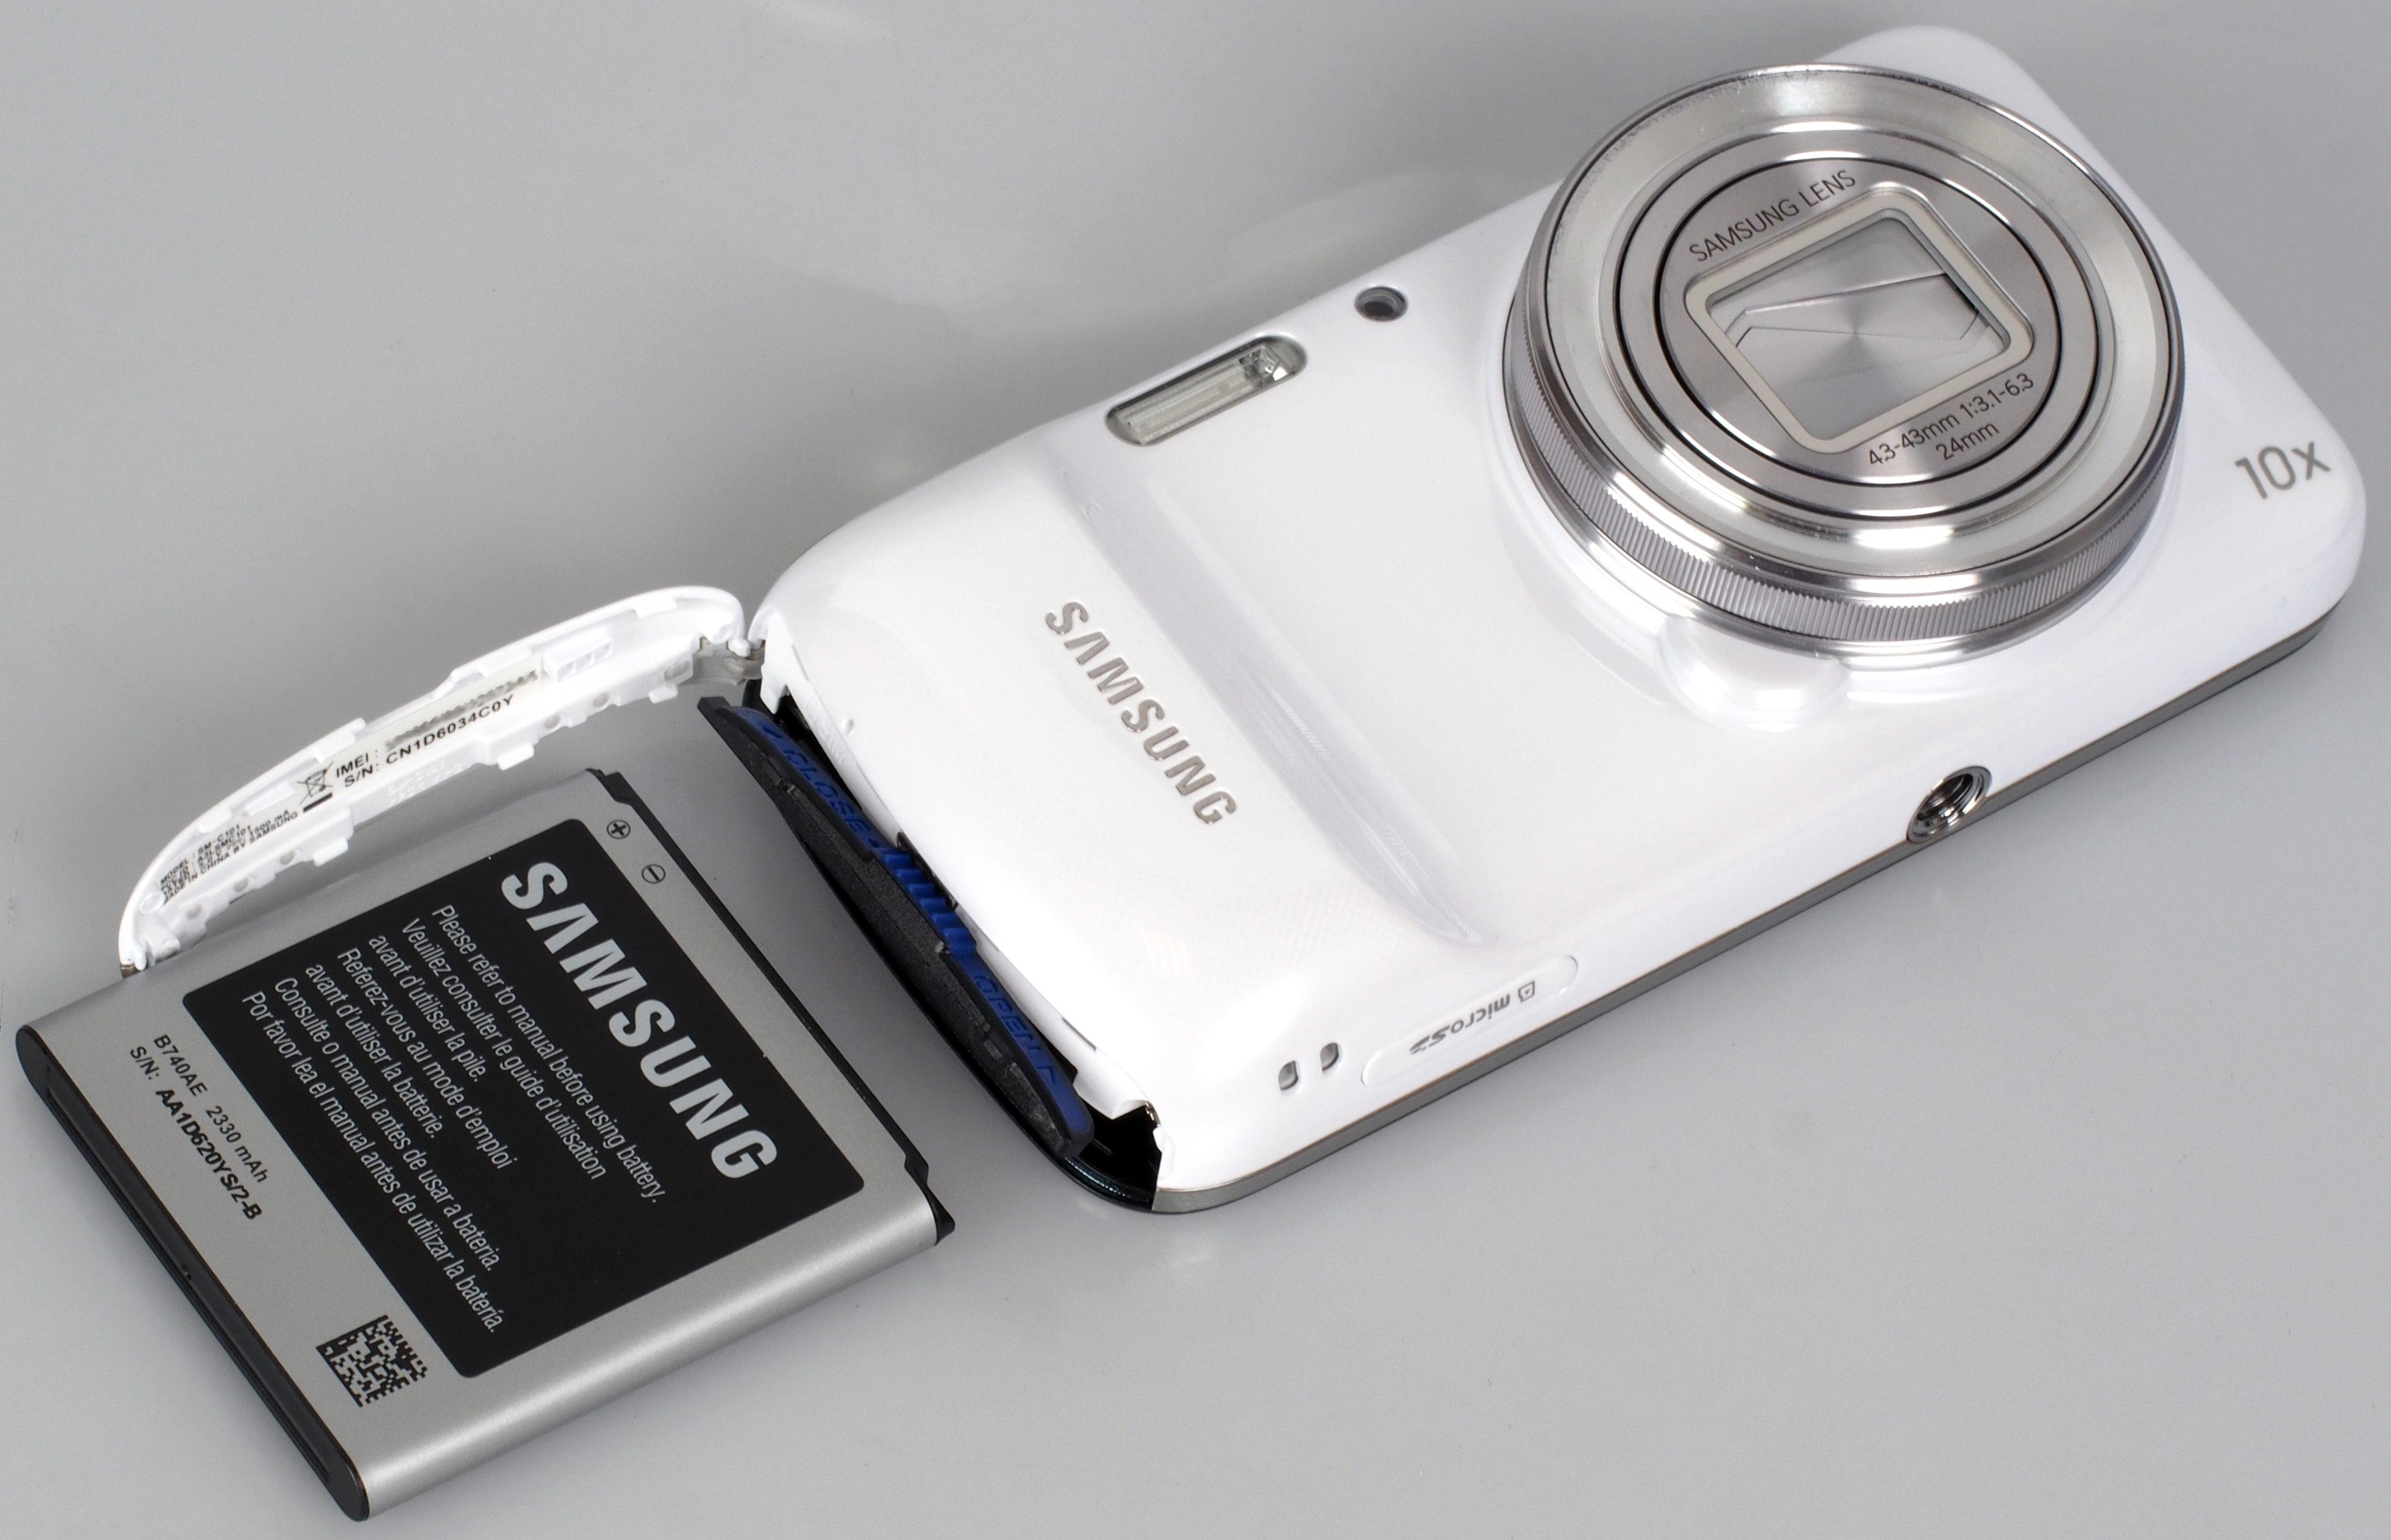 Samsung Galaxy S4 Zoom Camera Phone Review